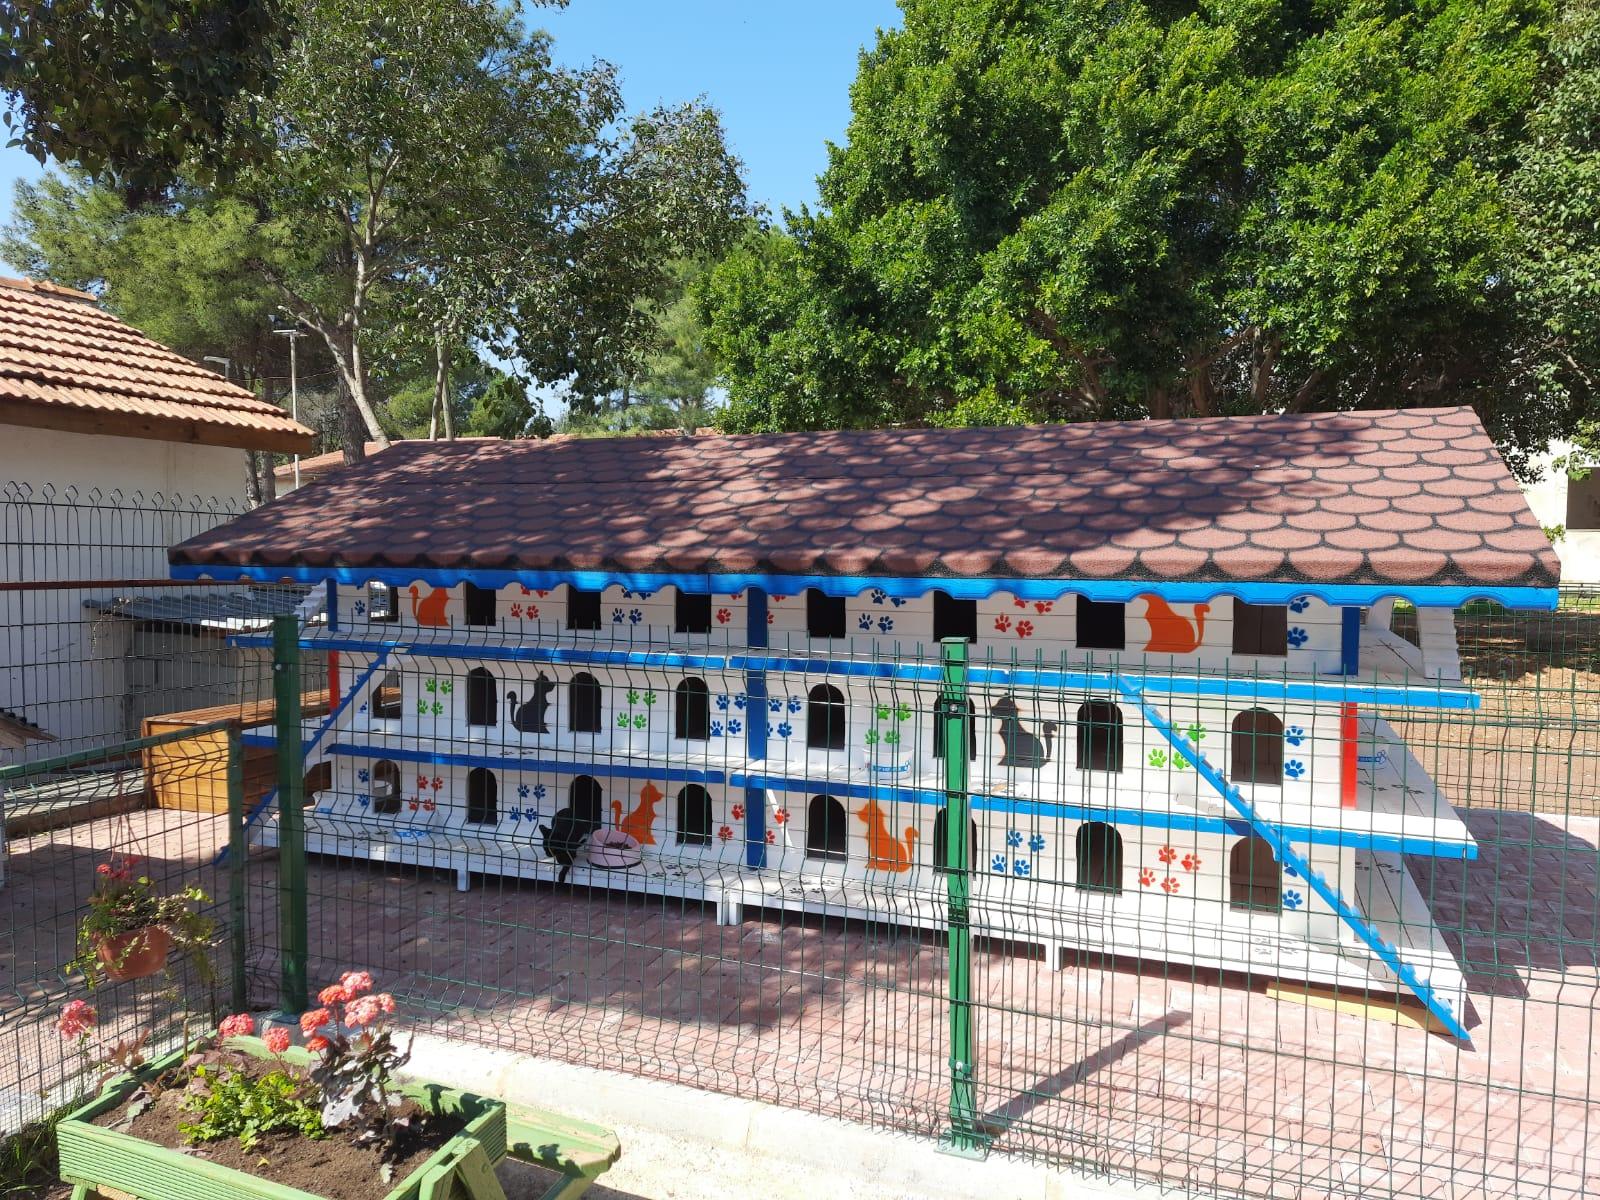 Antalya Kedi Apartmanı Çatısı Quickshingle'a Emanet